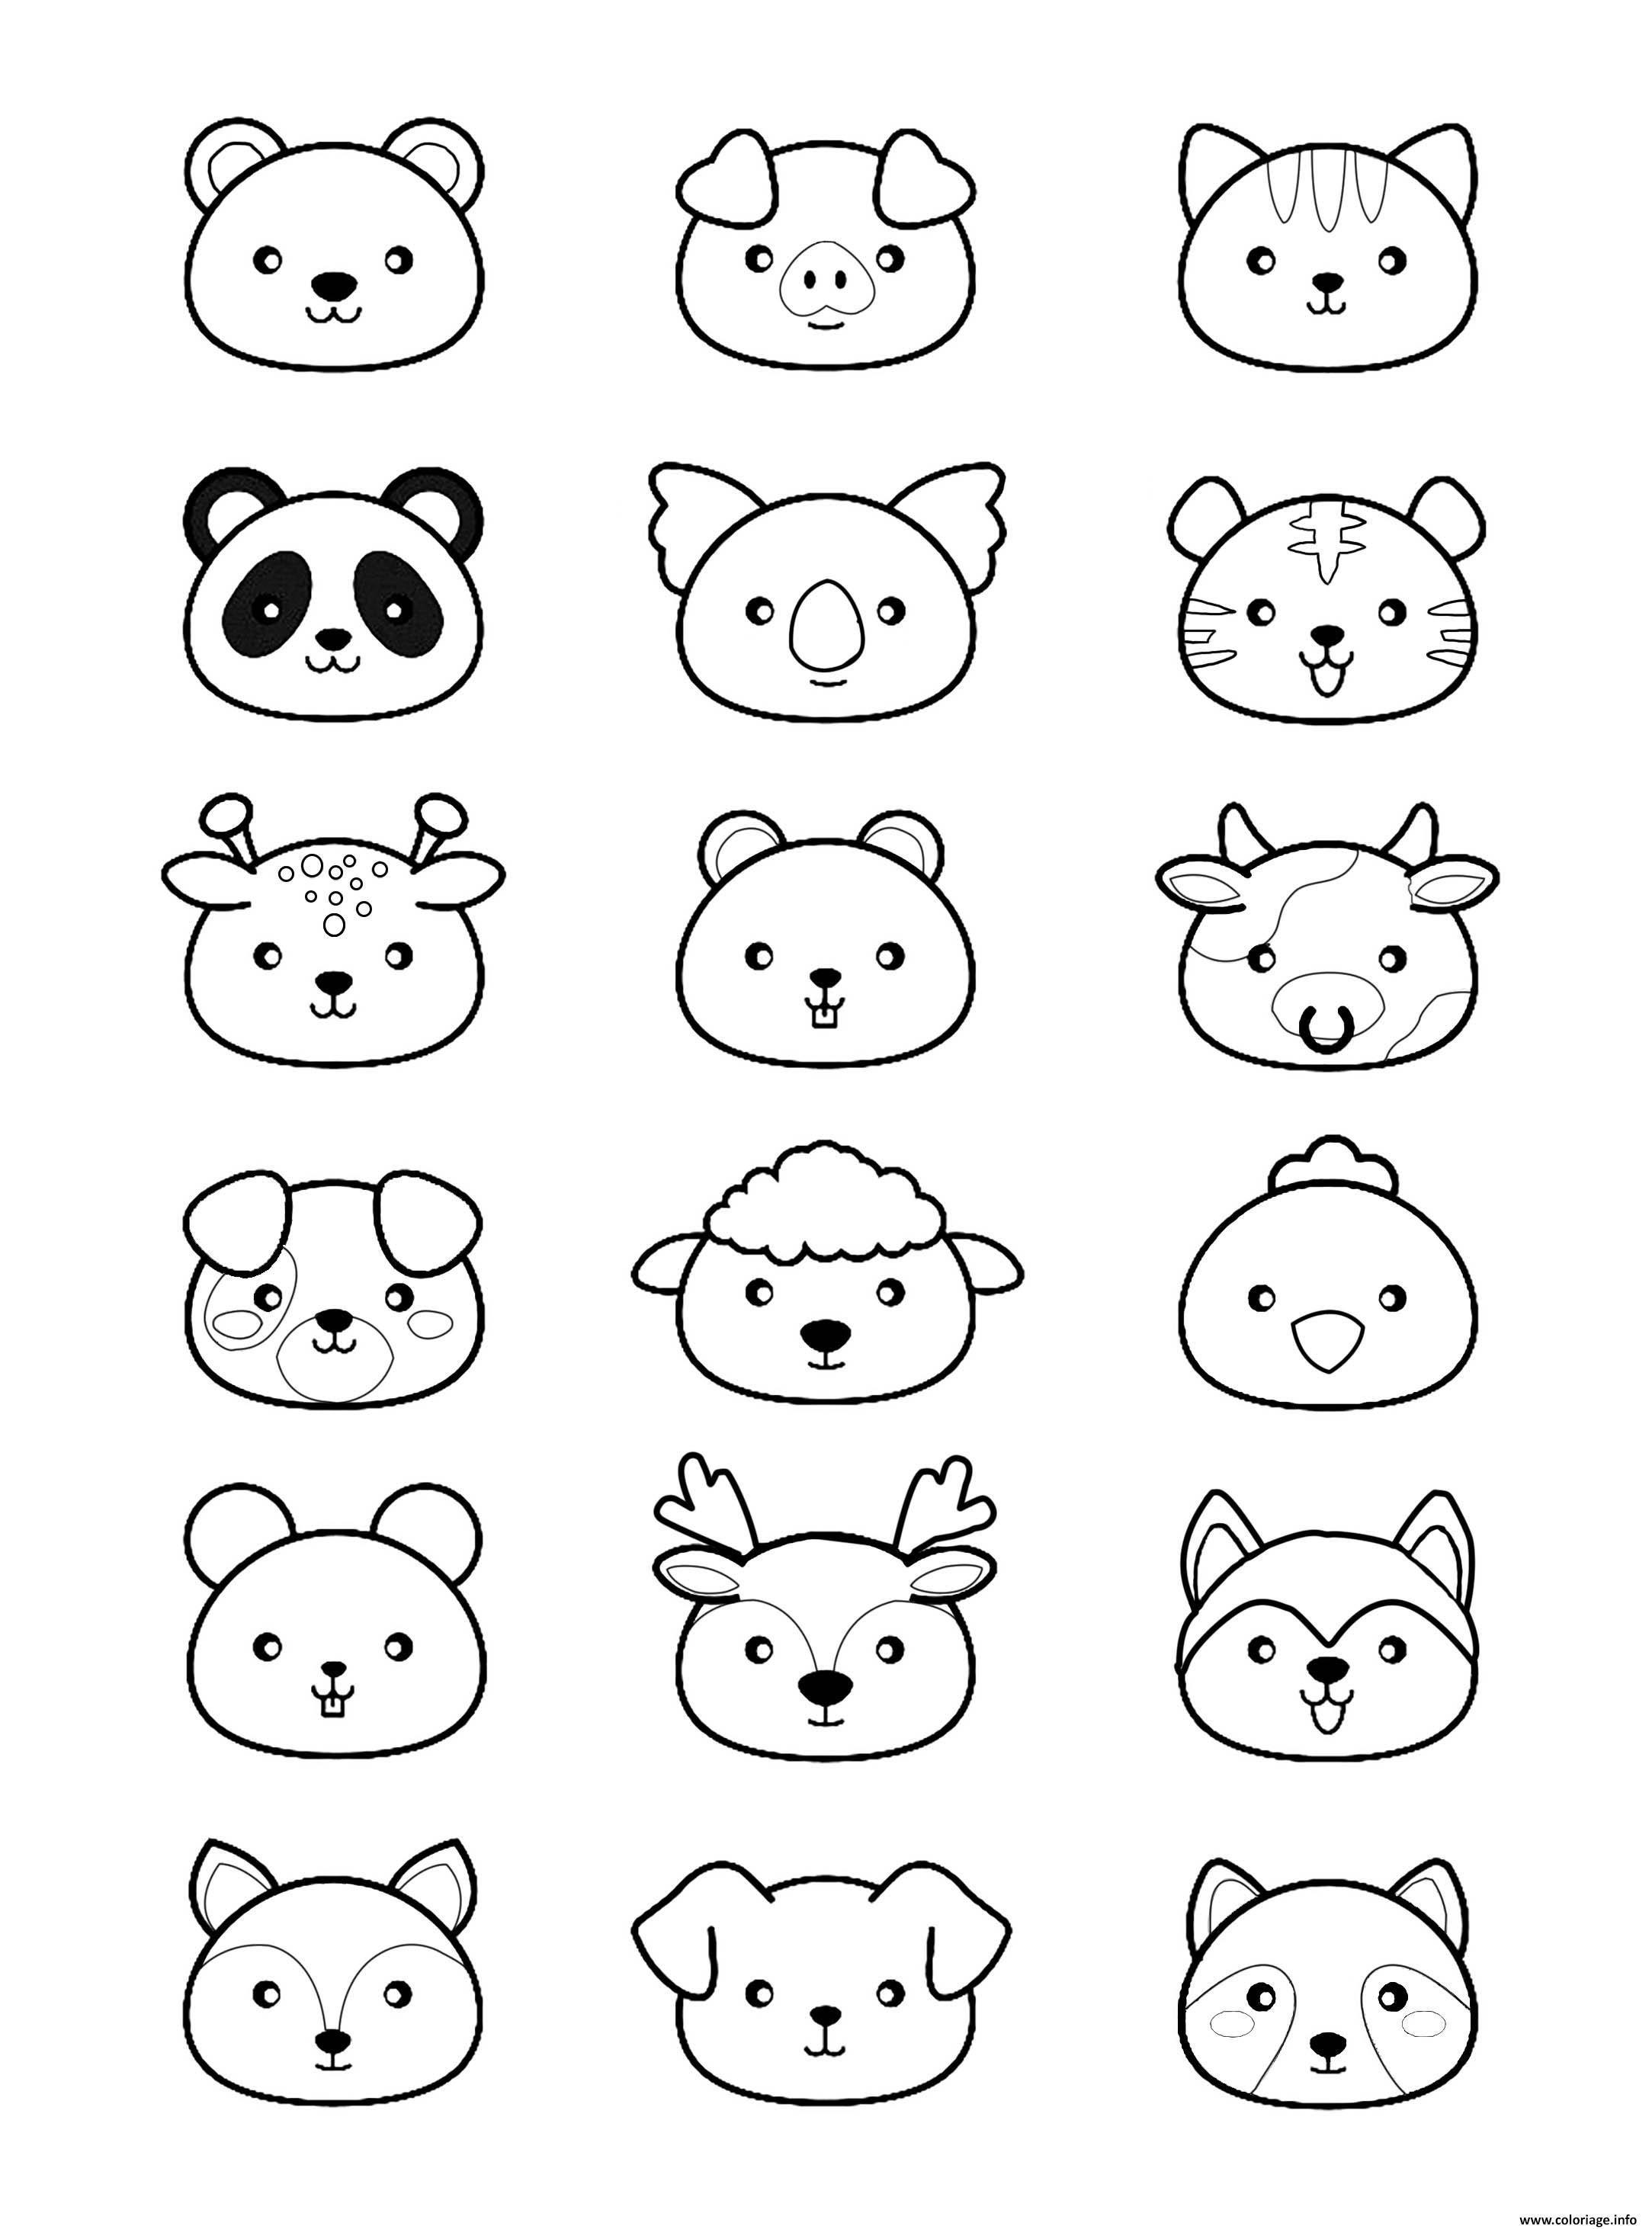 Coloriage Animaux Kawaii A Imprimer Coloriage Halloween A Imprimer Coloriage Halloween A Imprimer Panda Coloring Pages Cute Coloring Pages Cute Kawaii Drawings